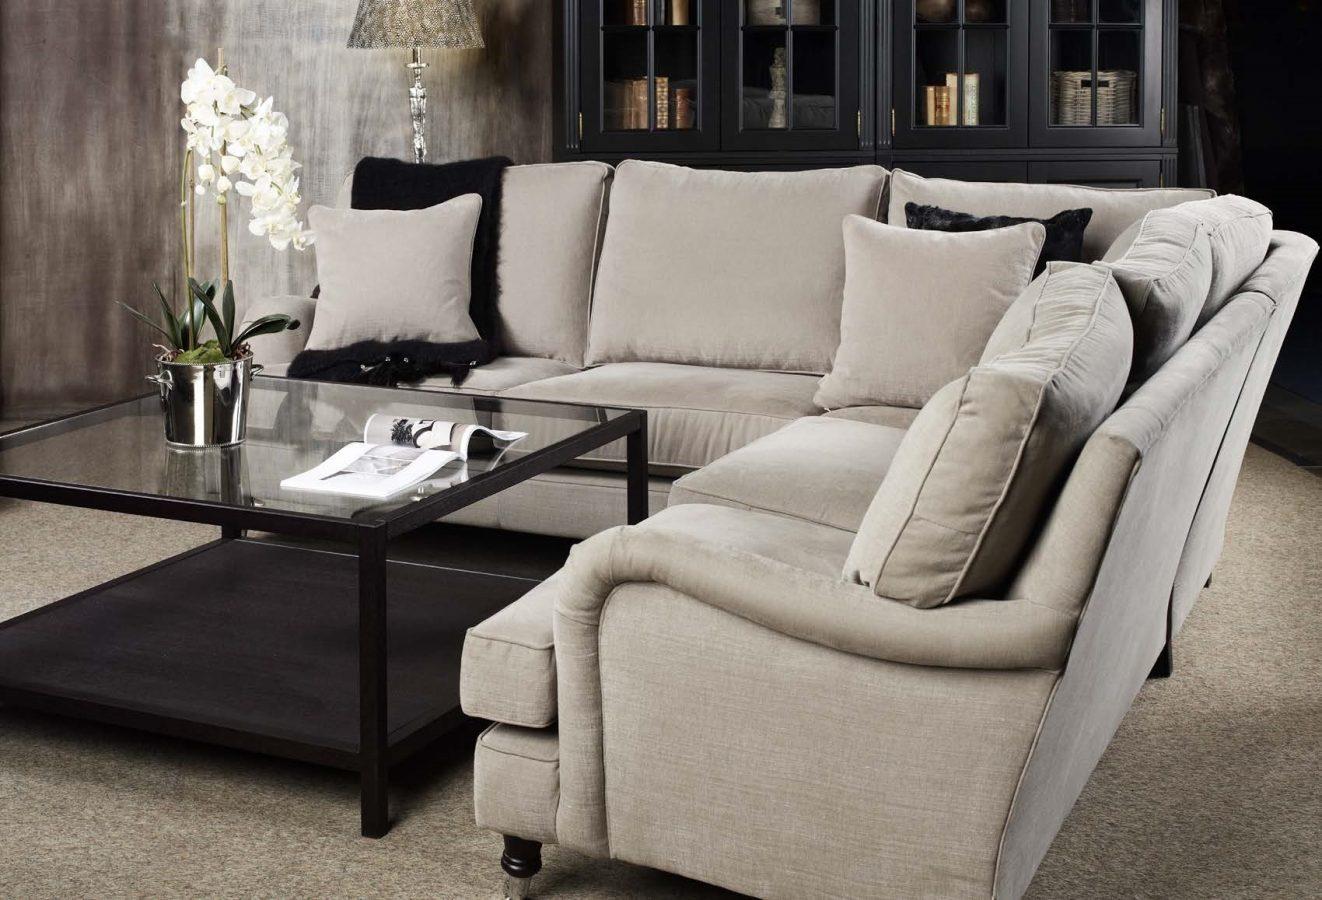 ENGL Sofa Sessel neu 6